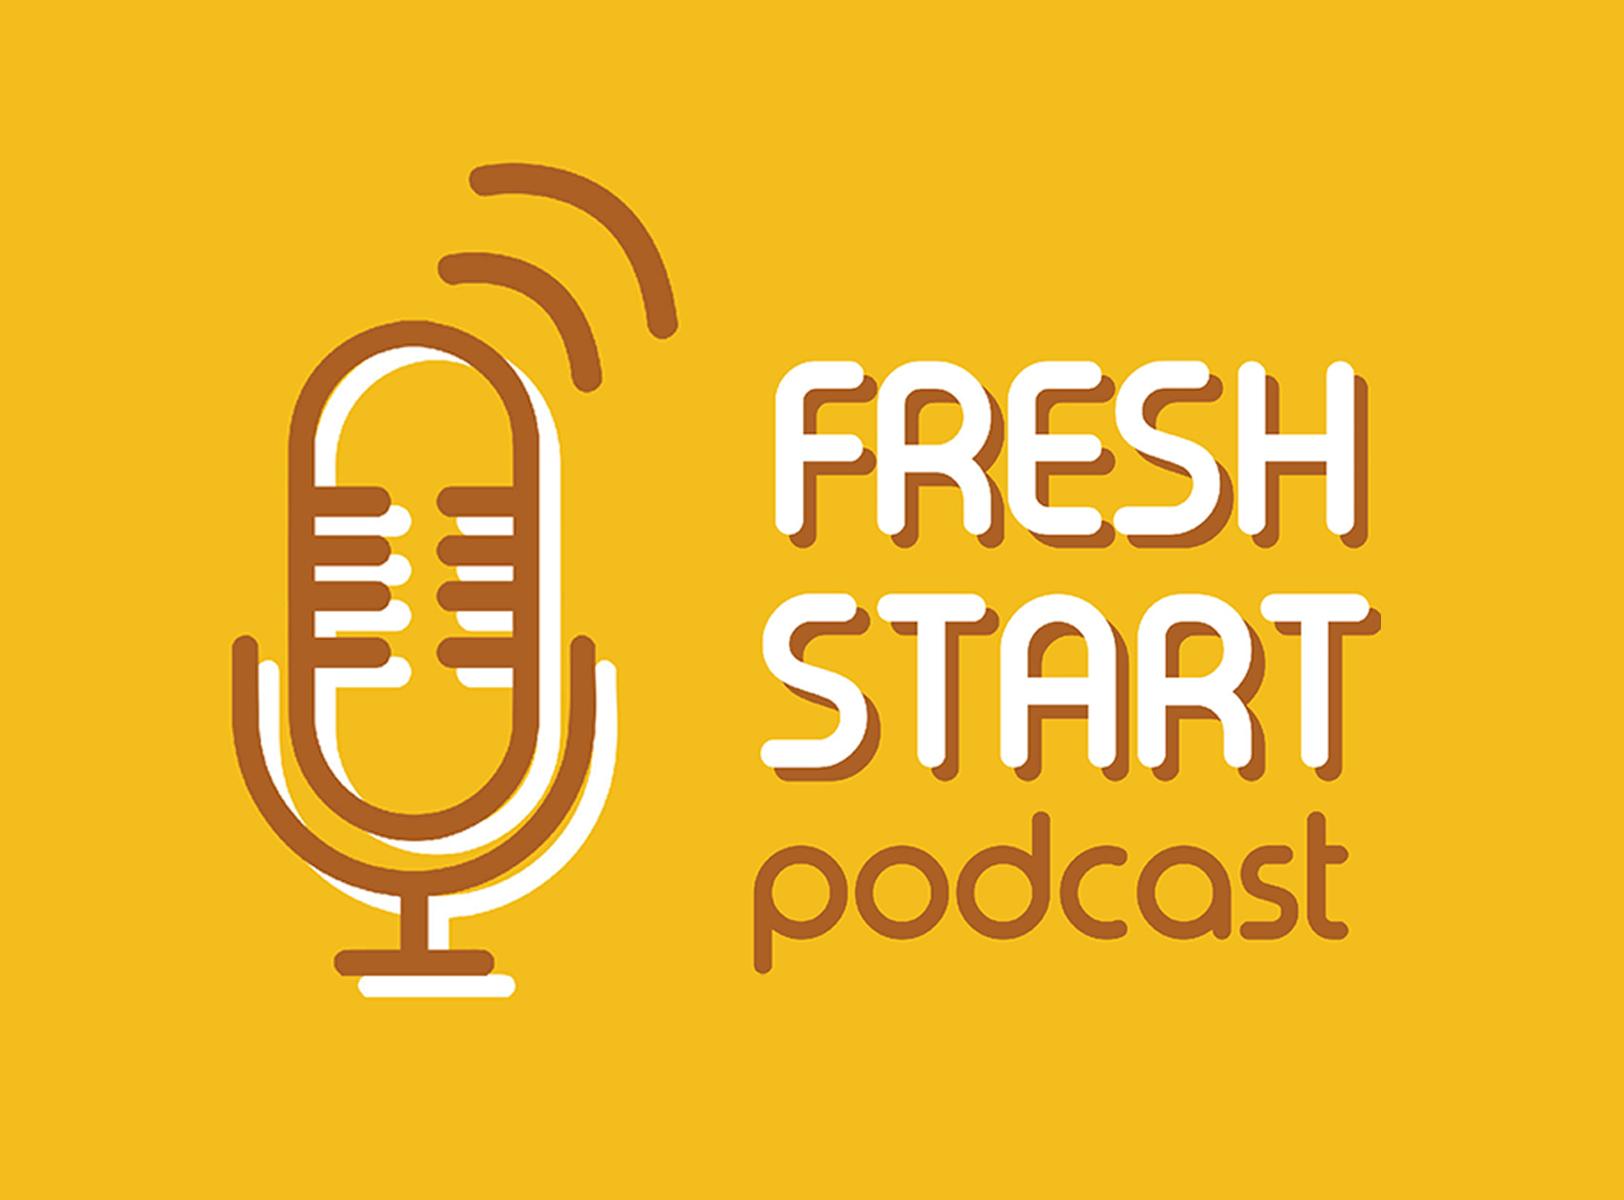 Fresh Start: Podcast News (5/7/2020 Thu.)